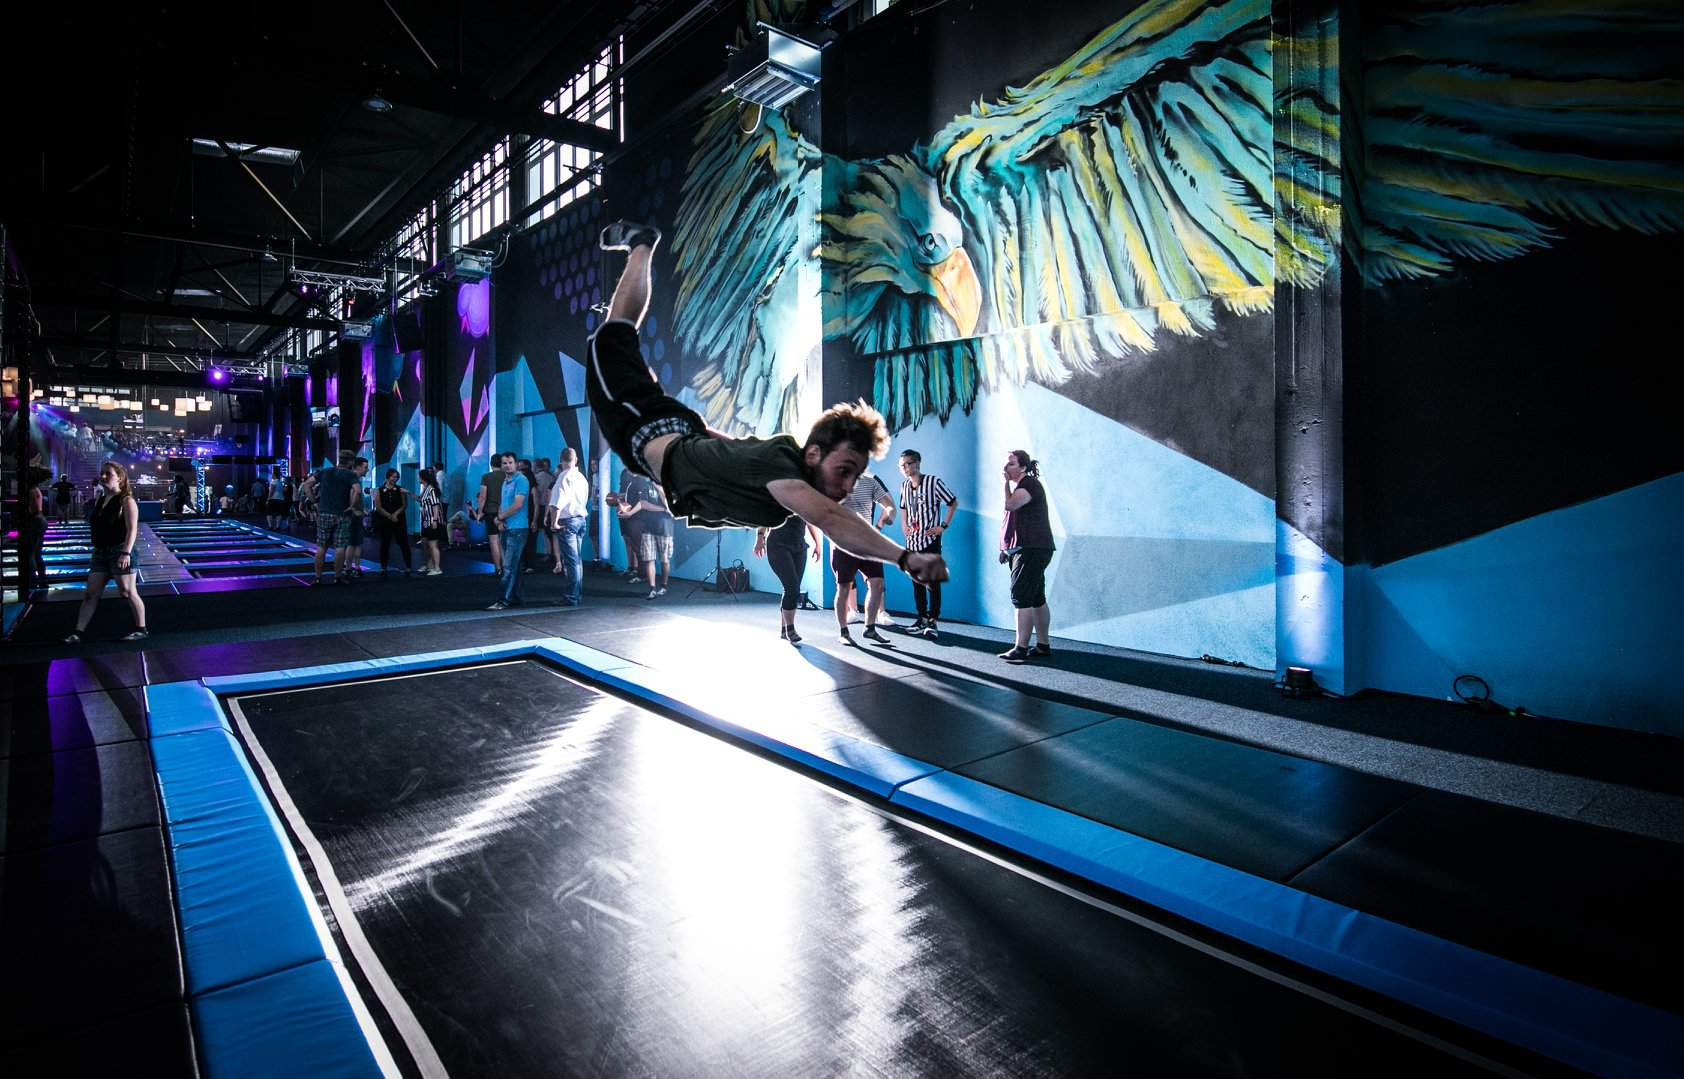 trampoline park Dresden Superfly